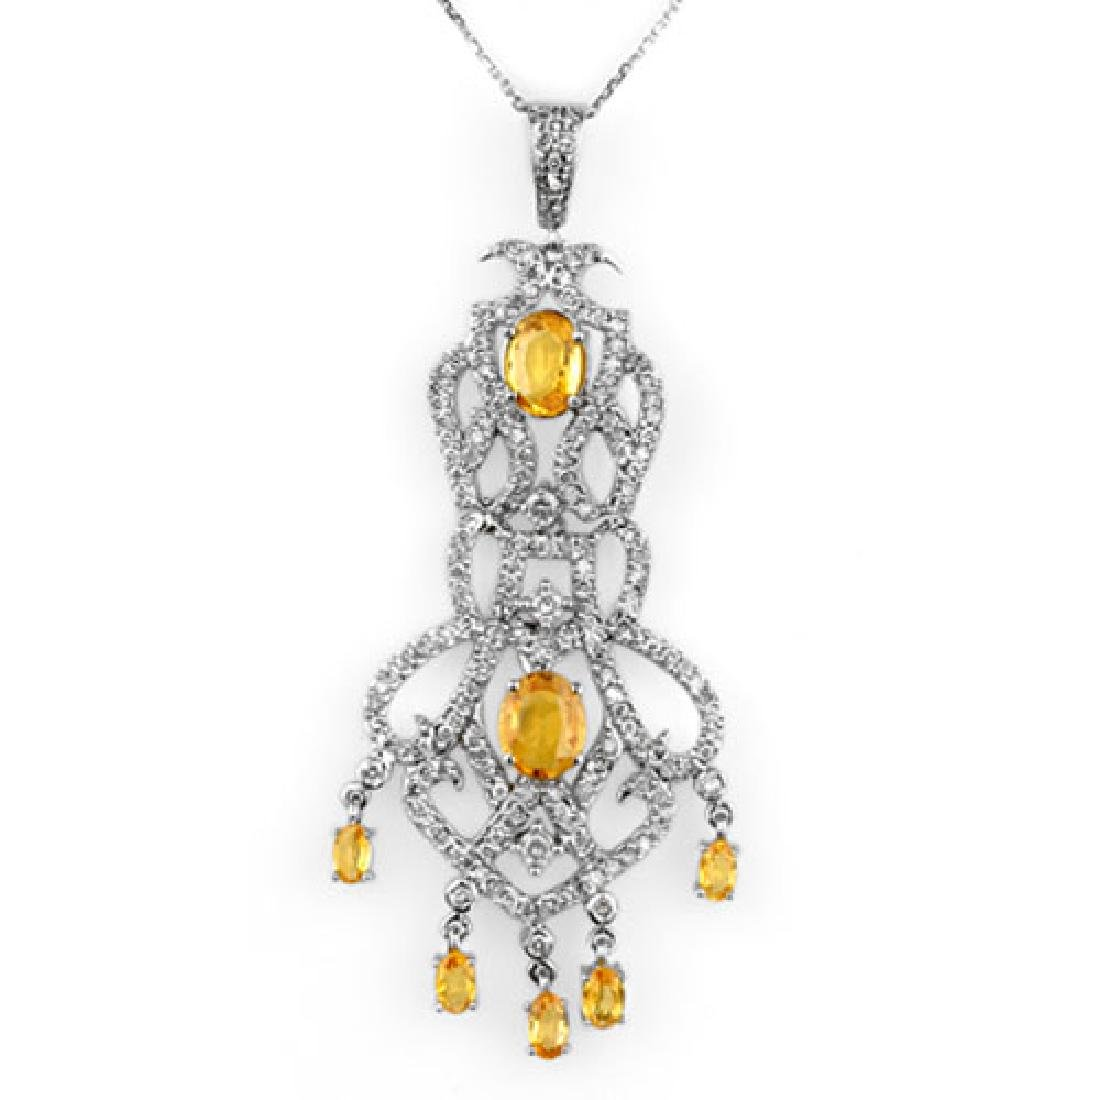 7.65 CTW Yellow Sapphire & Diamond Necklace 14K White